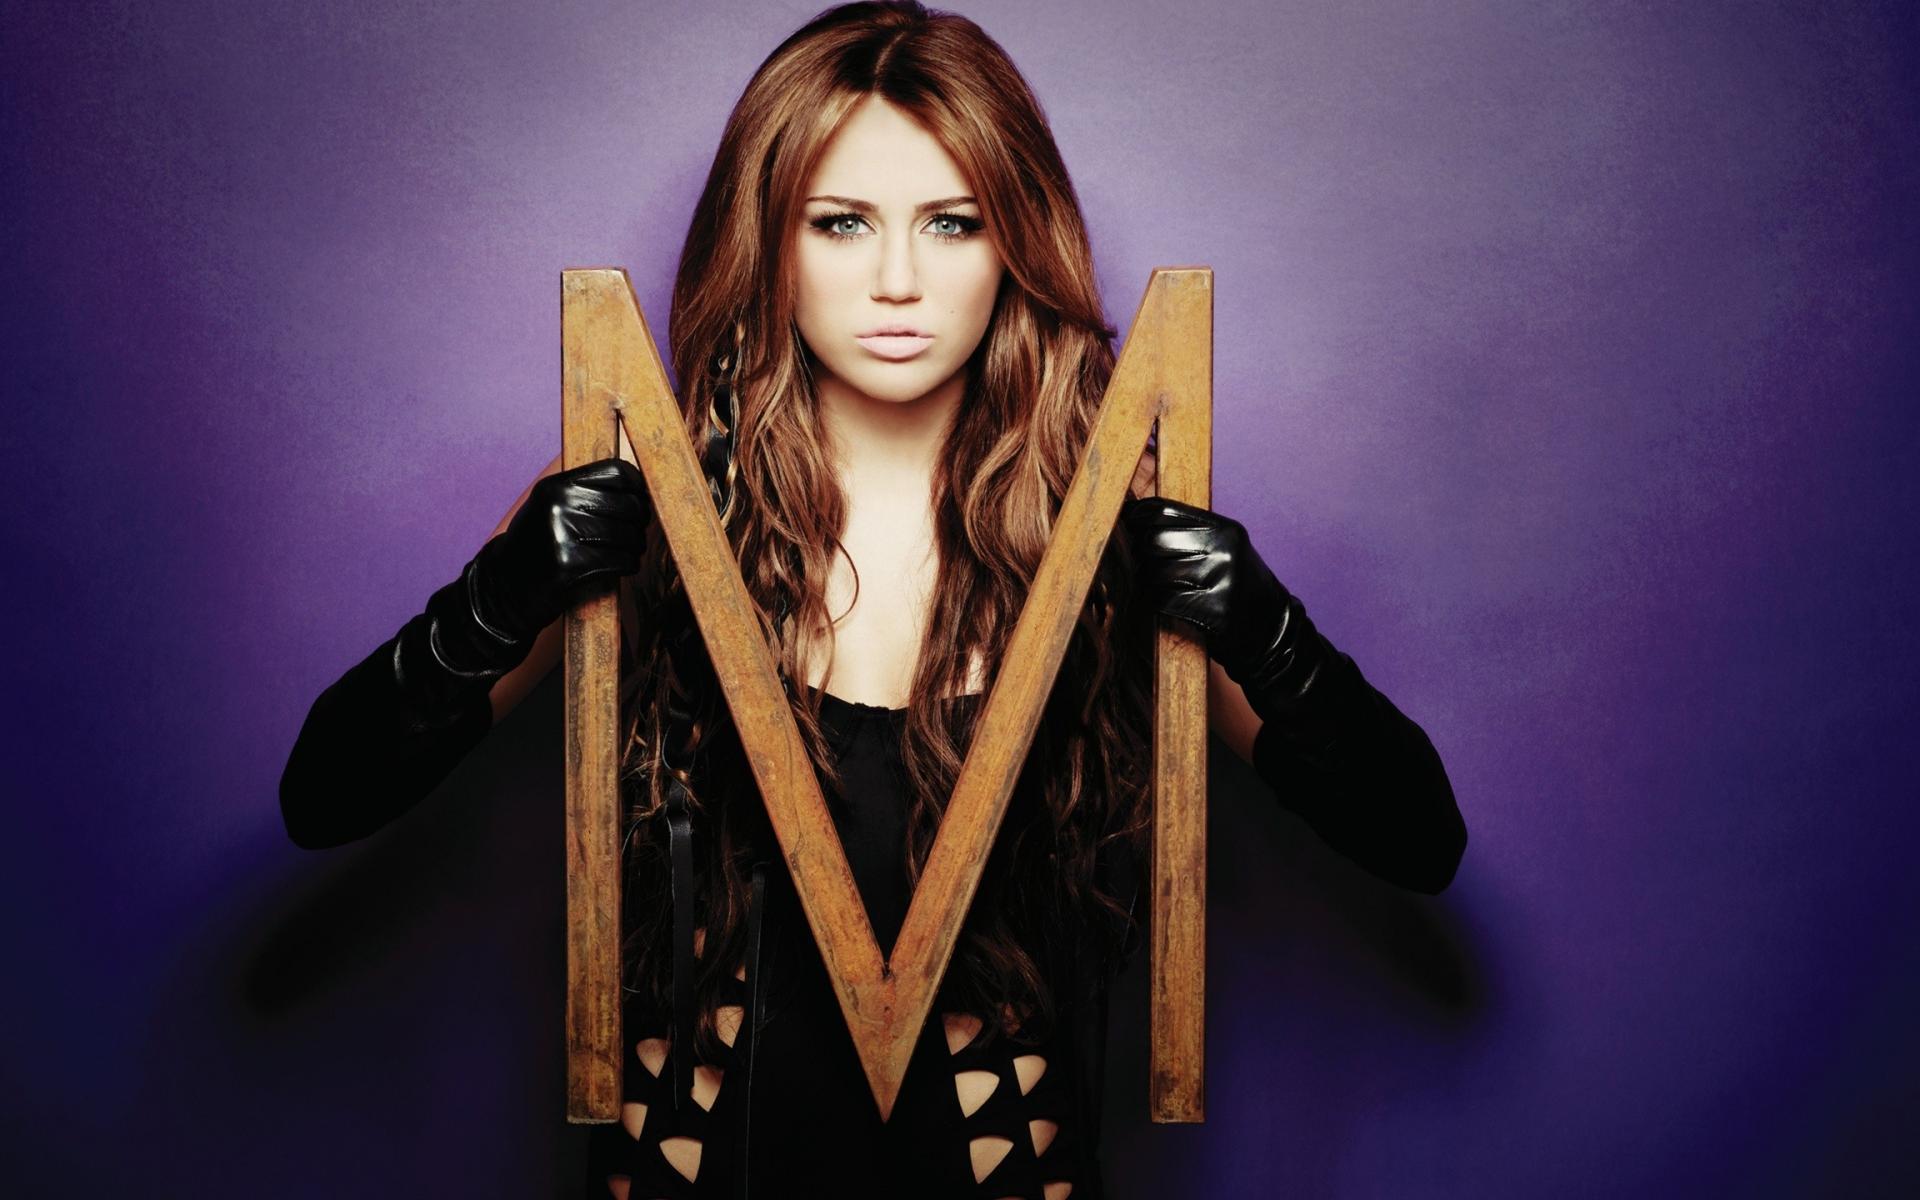 Miley Cyrus Gloves Hearts Singer Actor Hd Wallpaper-3537